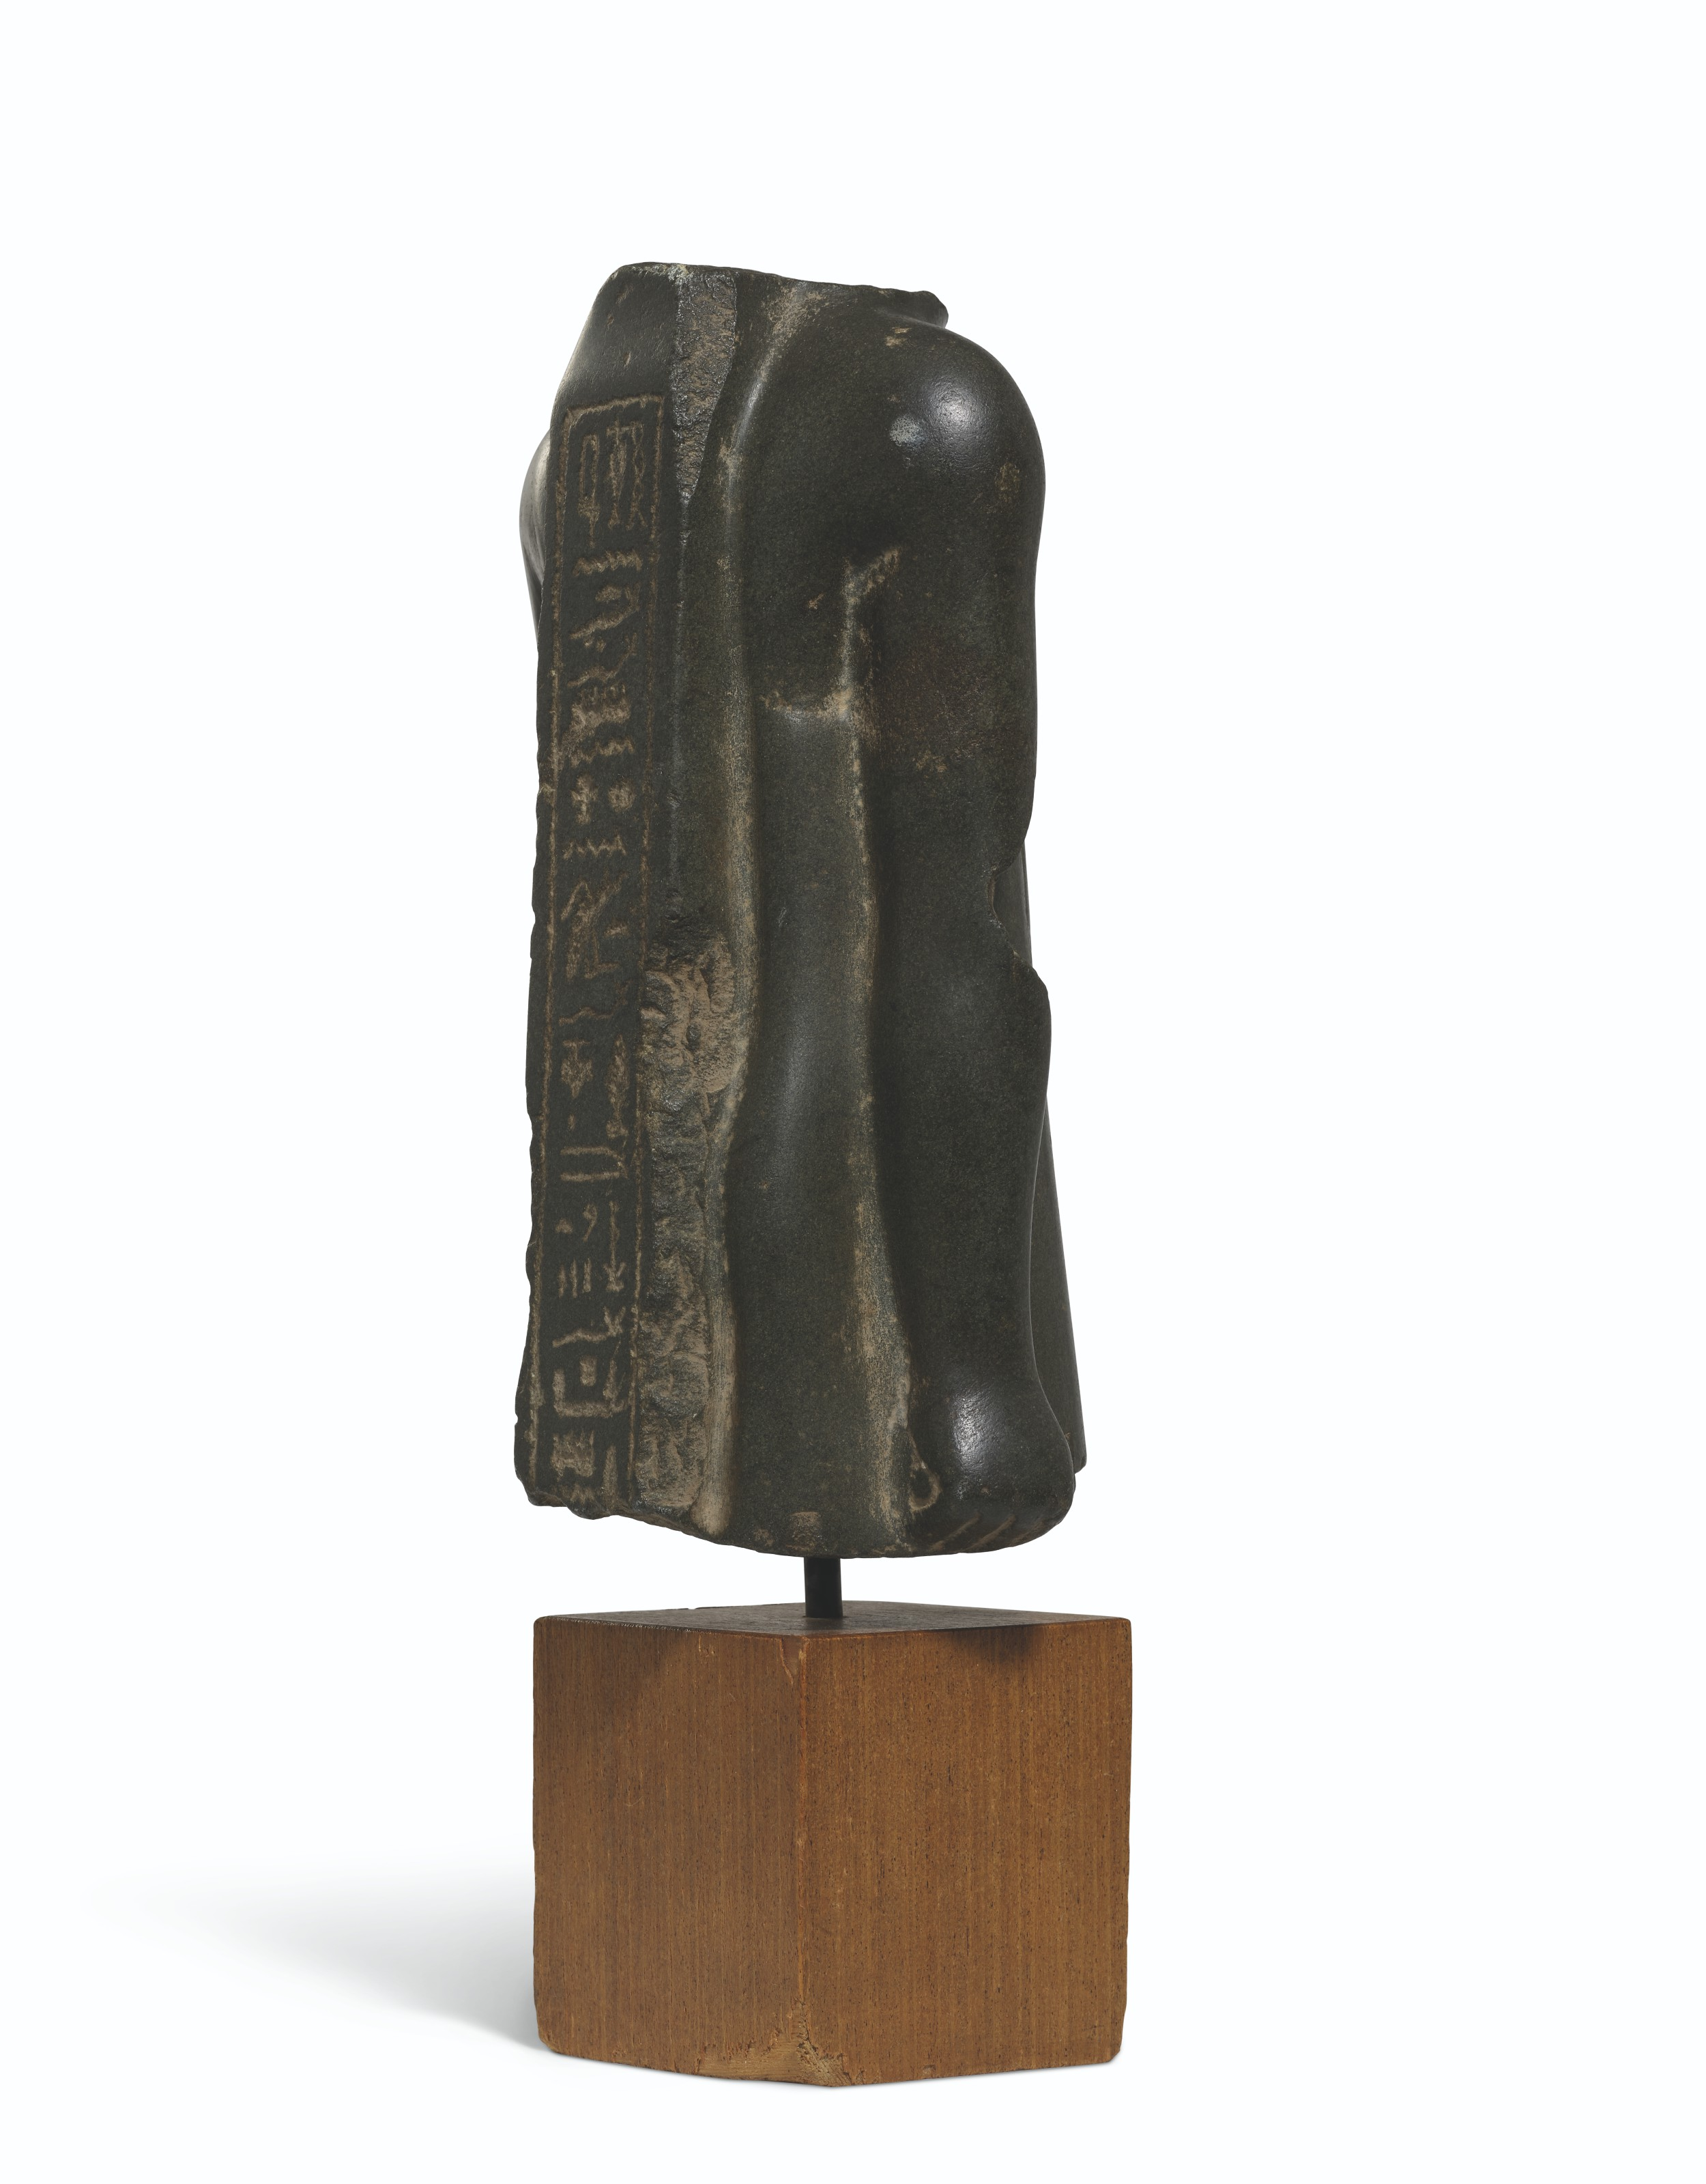 AN EGYPTIAN POLYCHROME LIMESTONE RELIEF FRAGMENT